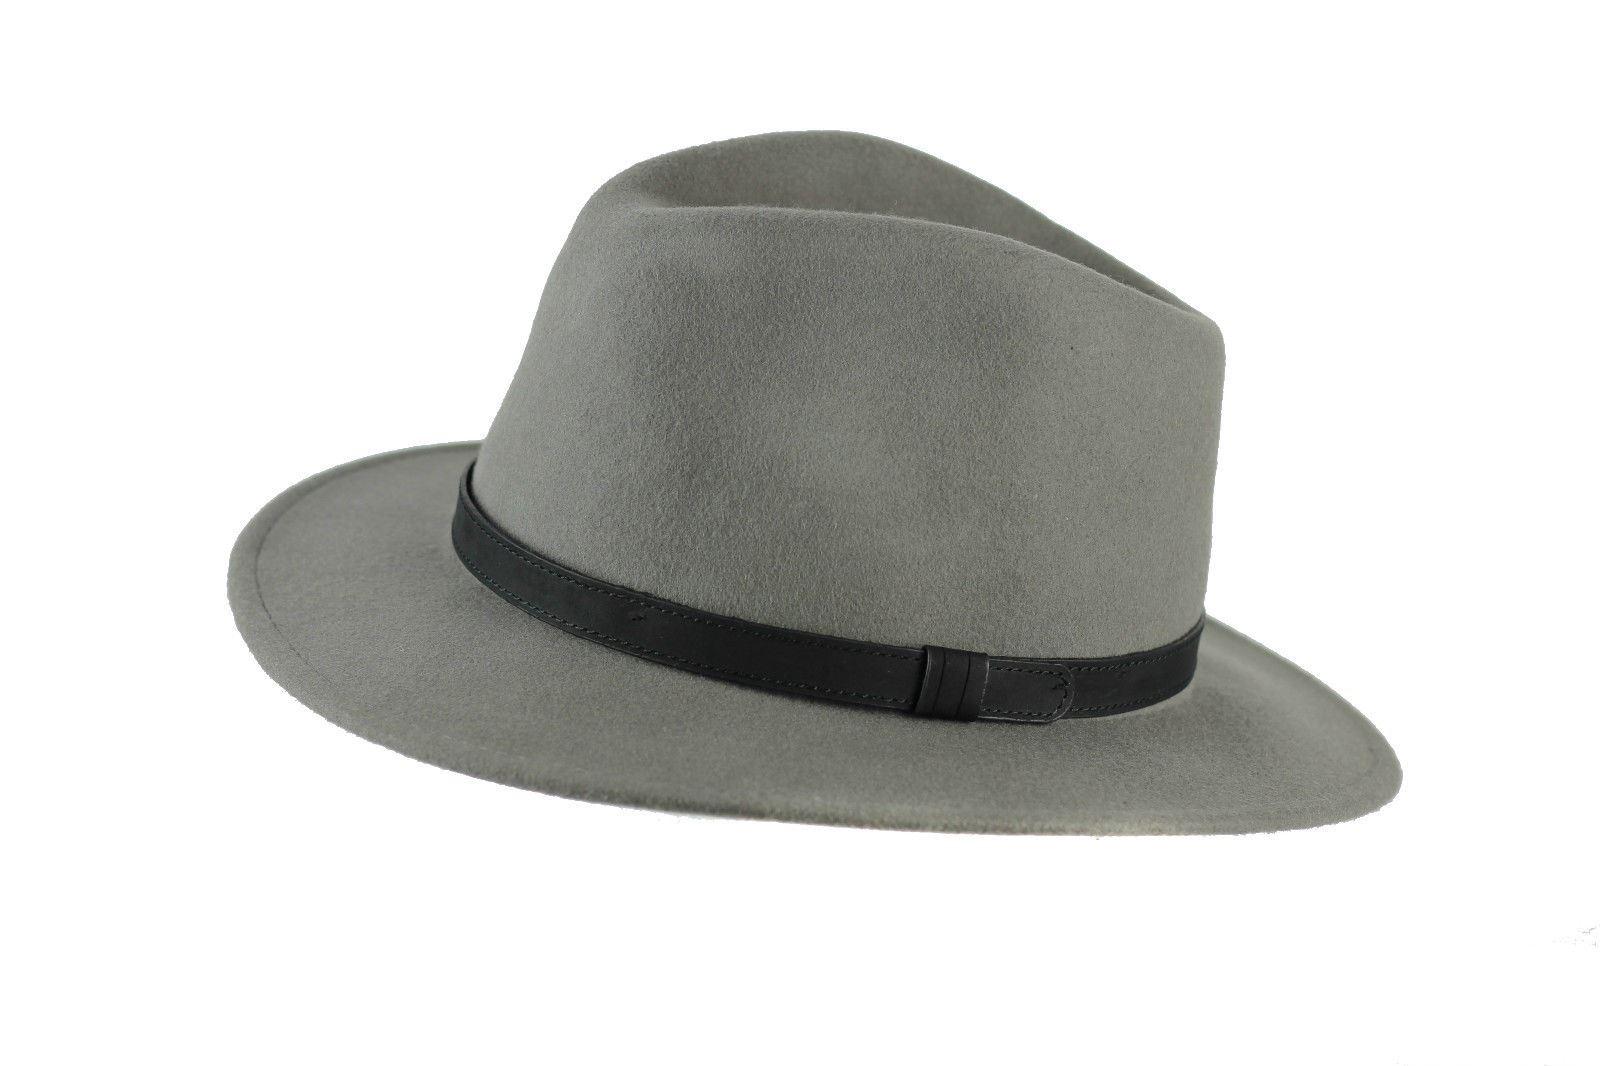 Unisex Mens Women Vintage 100% Felt Wool Wide Brim Crushable Fedora ... d7aae0409d3